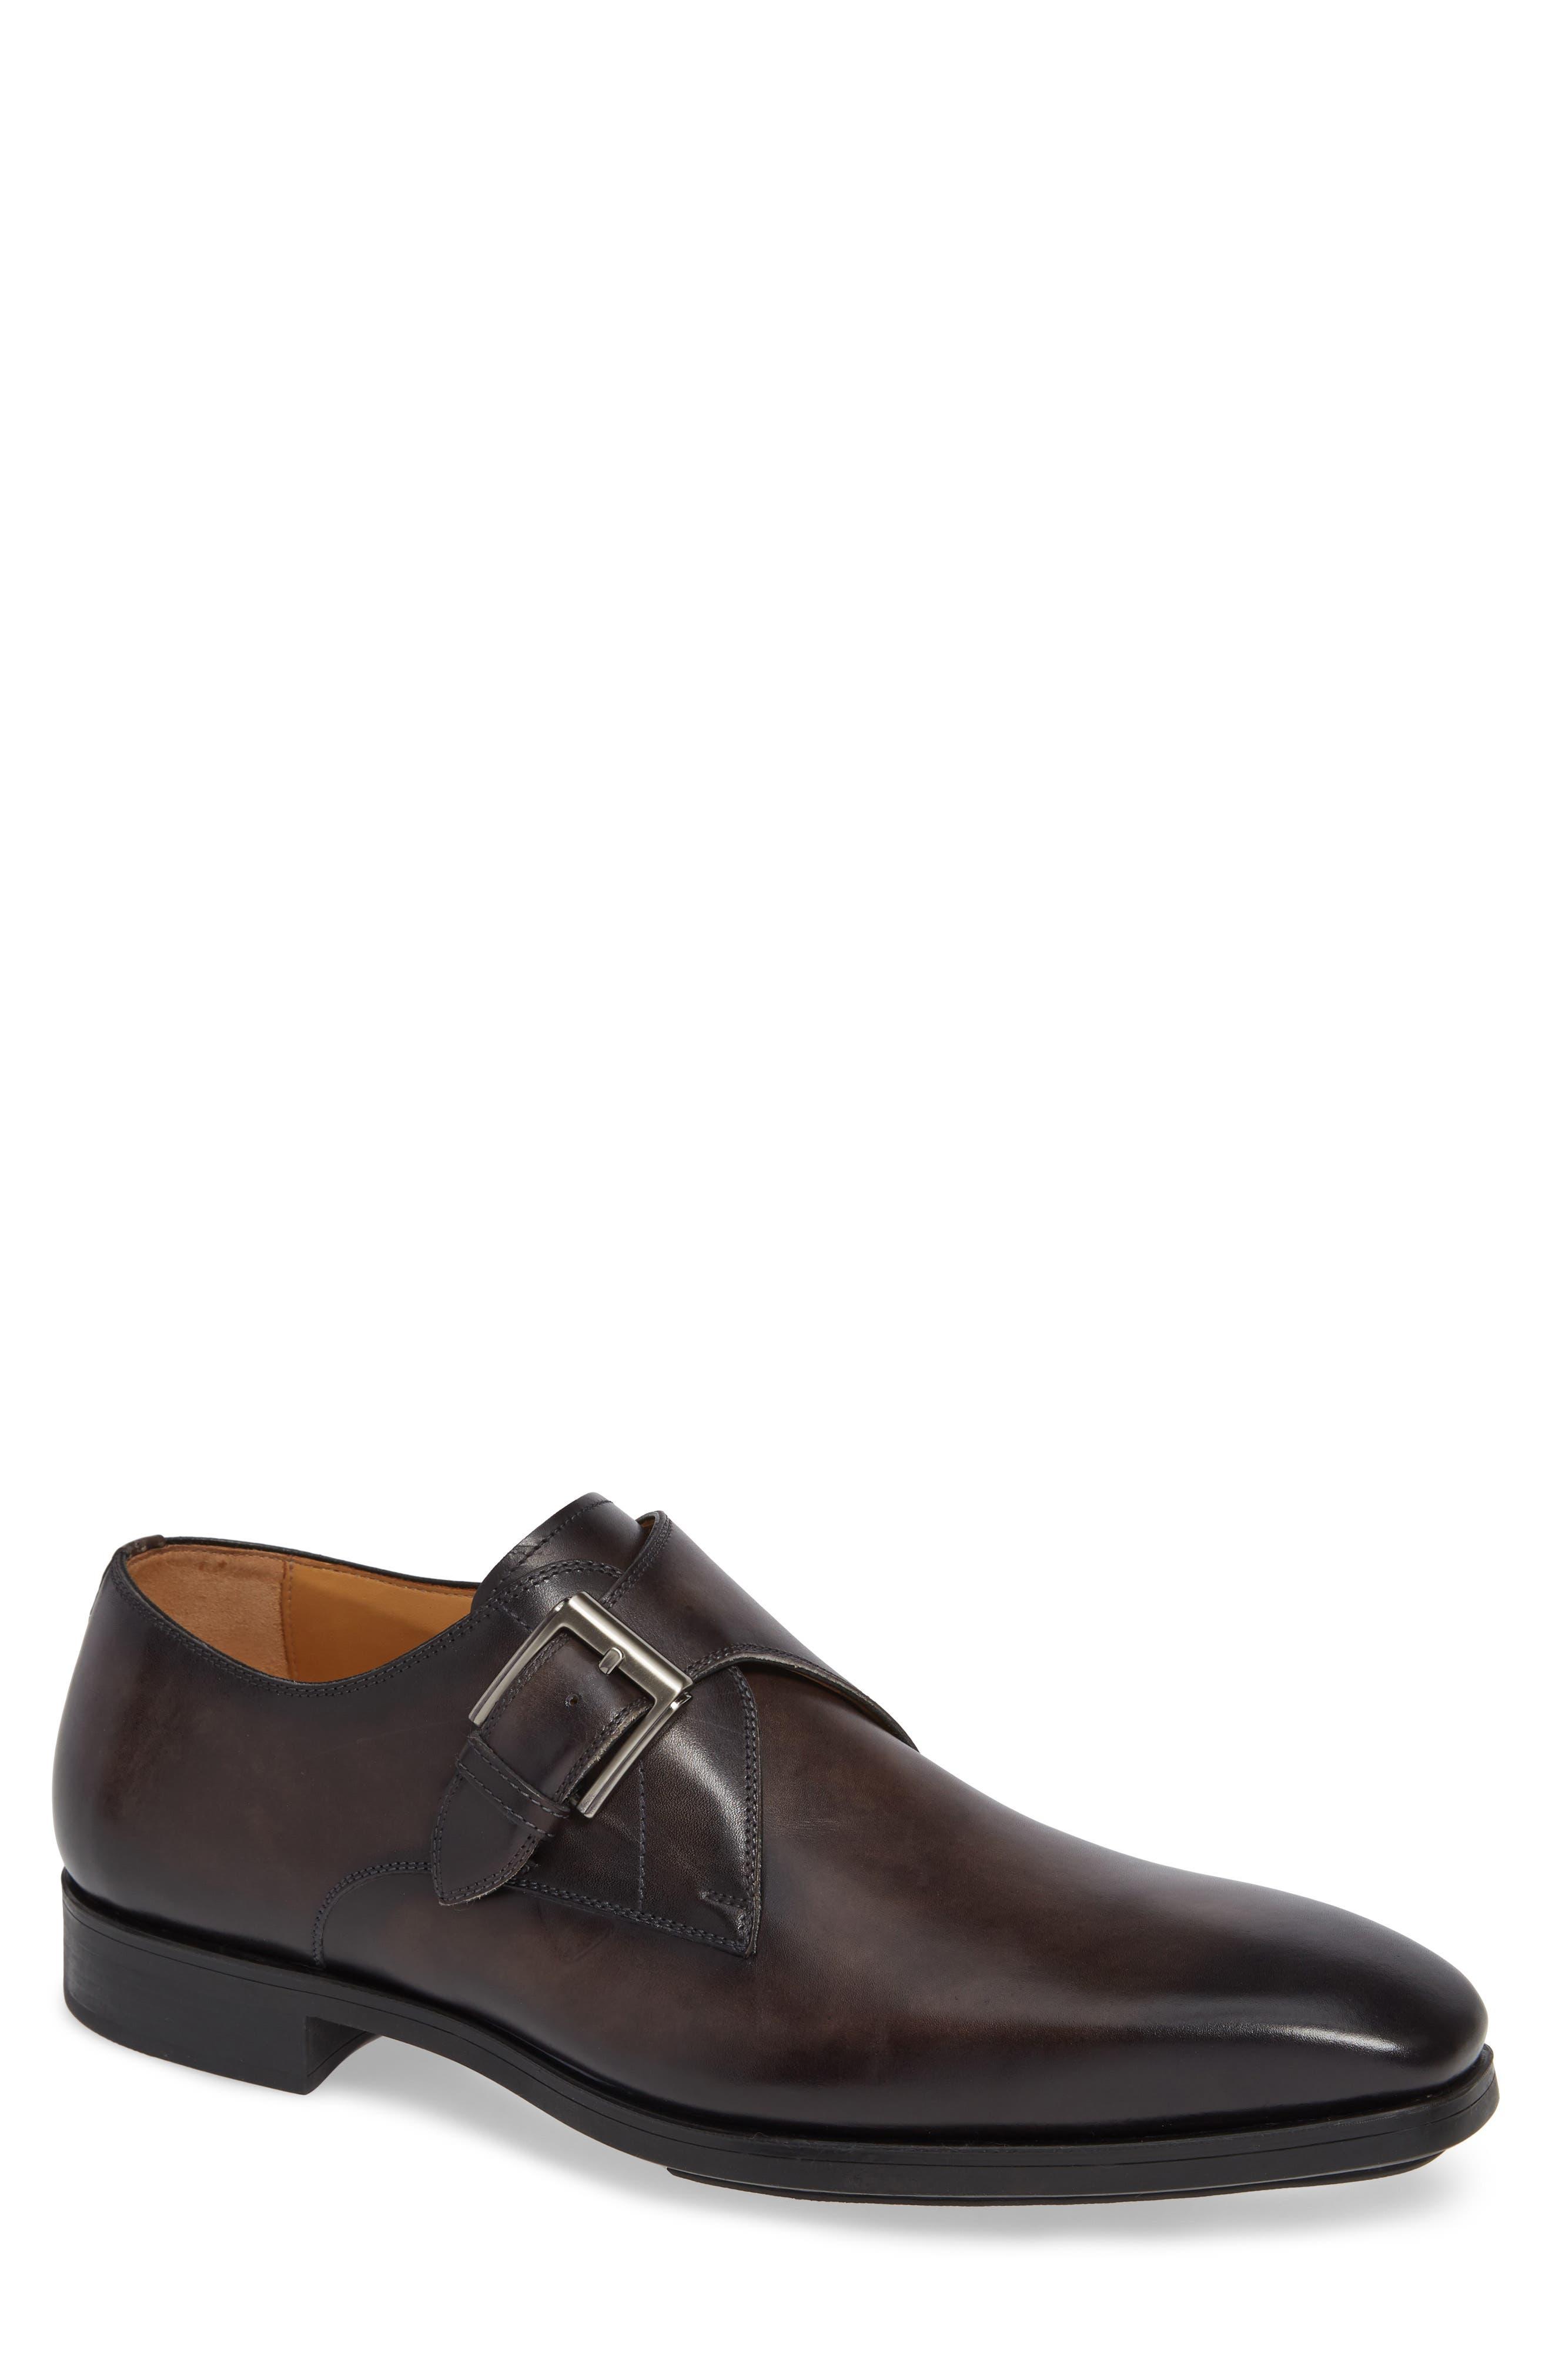 MAGNANNI, Roddy Diversa Plain Toe Monk Strap Shoe, Main thumbnail 1, color, GREY LEATHER